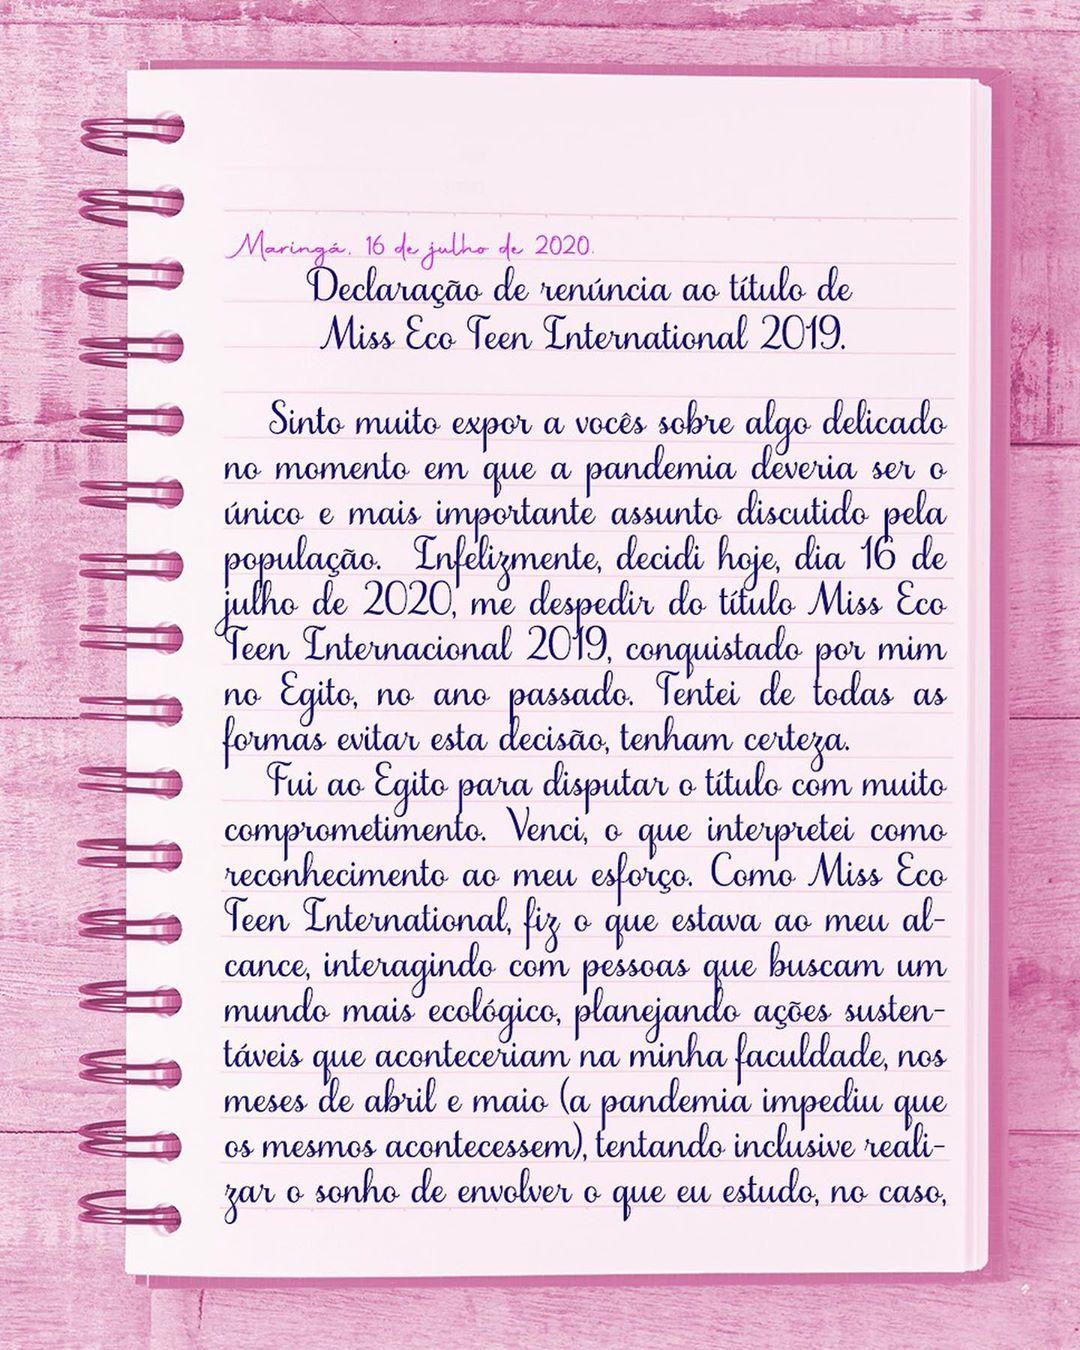 maria eduarda valotto, miss eco teen 2019. (renunciou). - Página 2 10933710